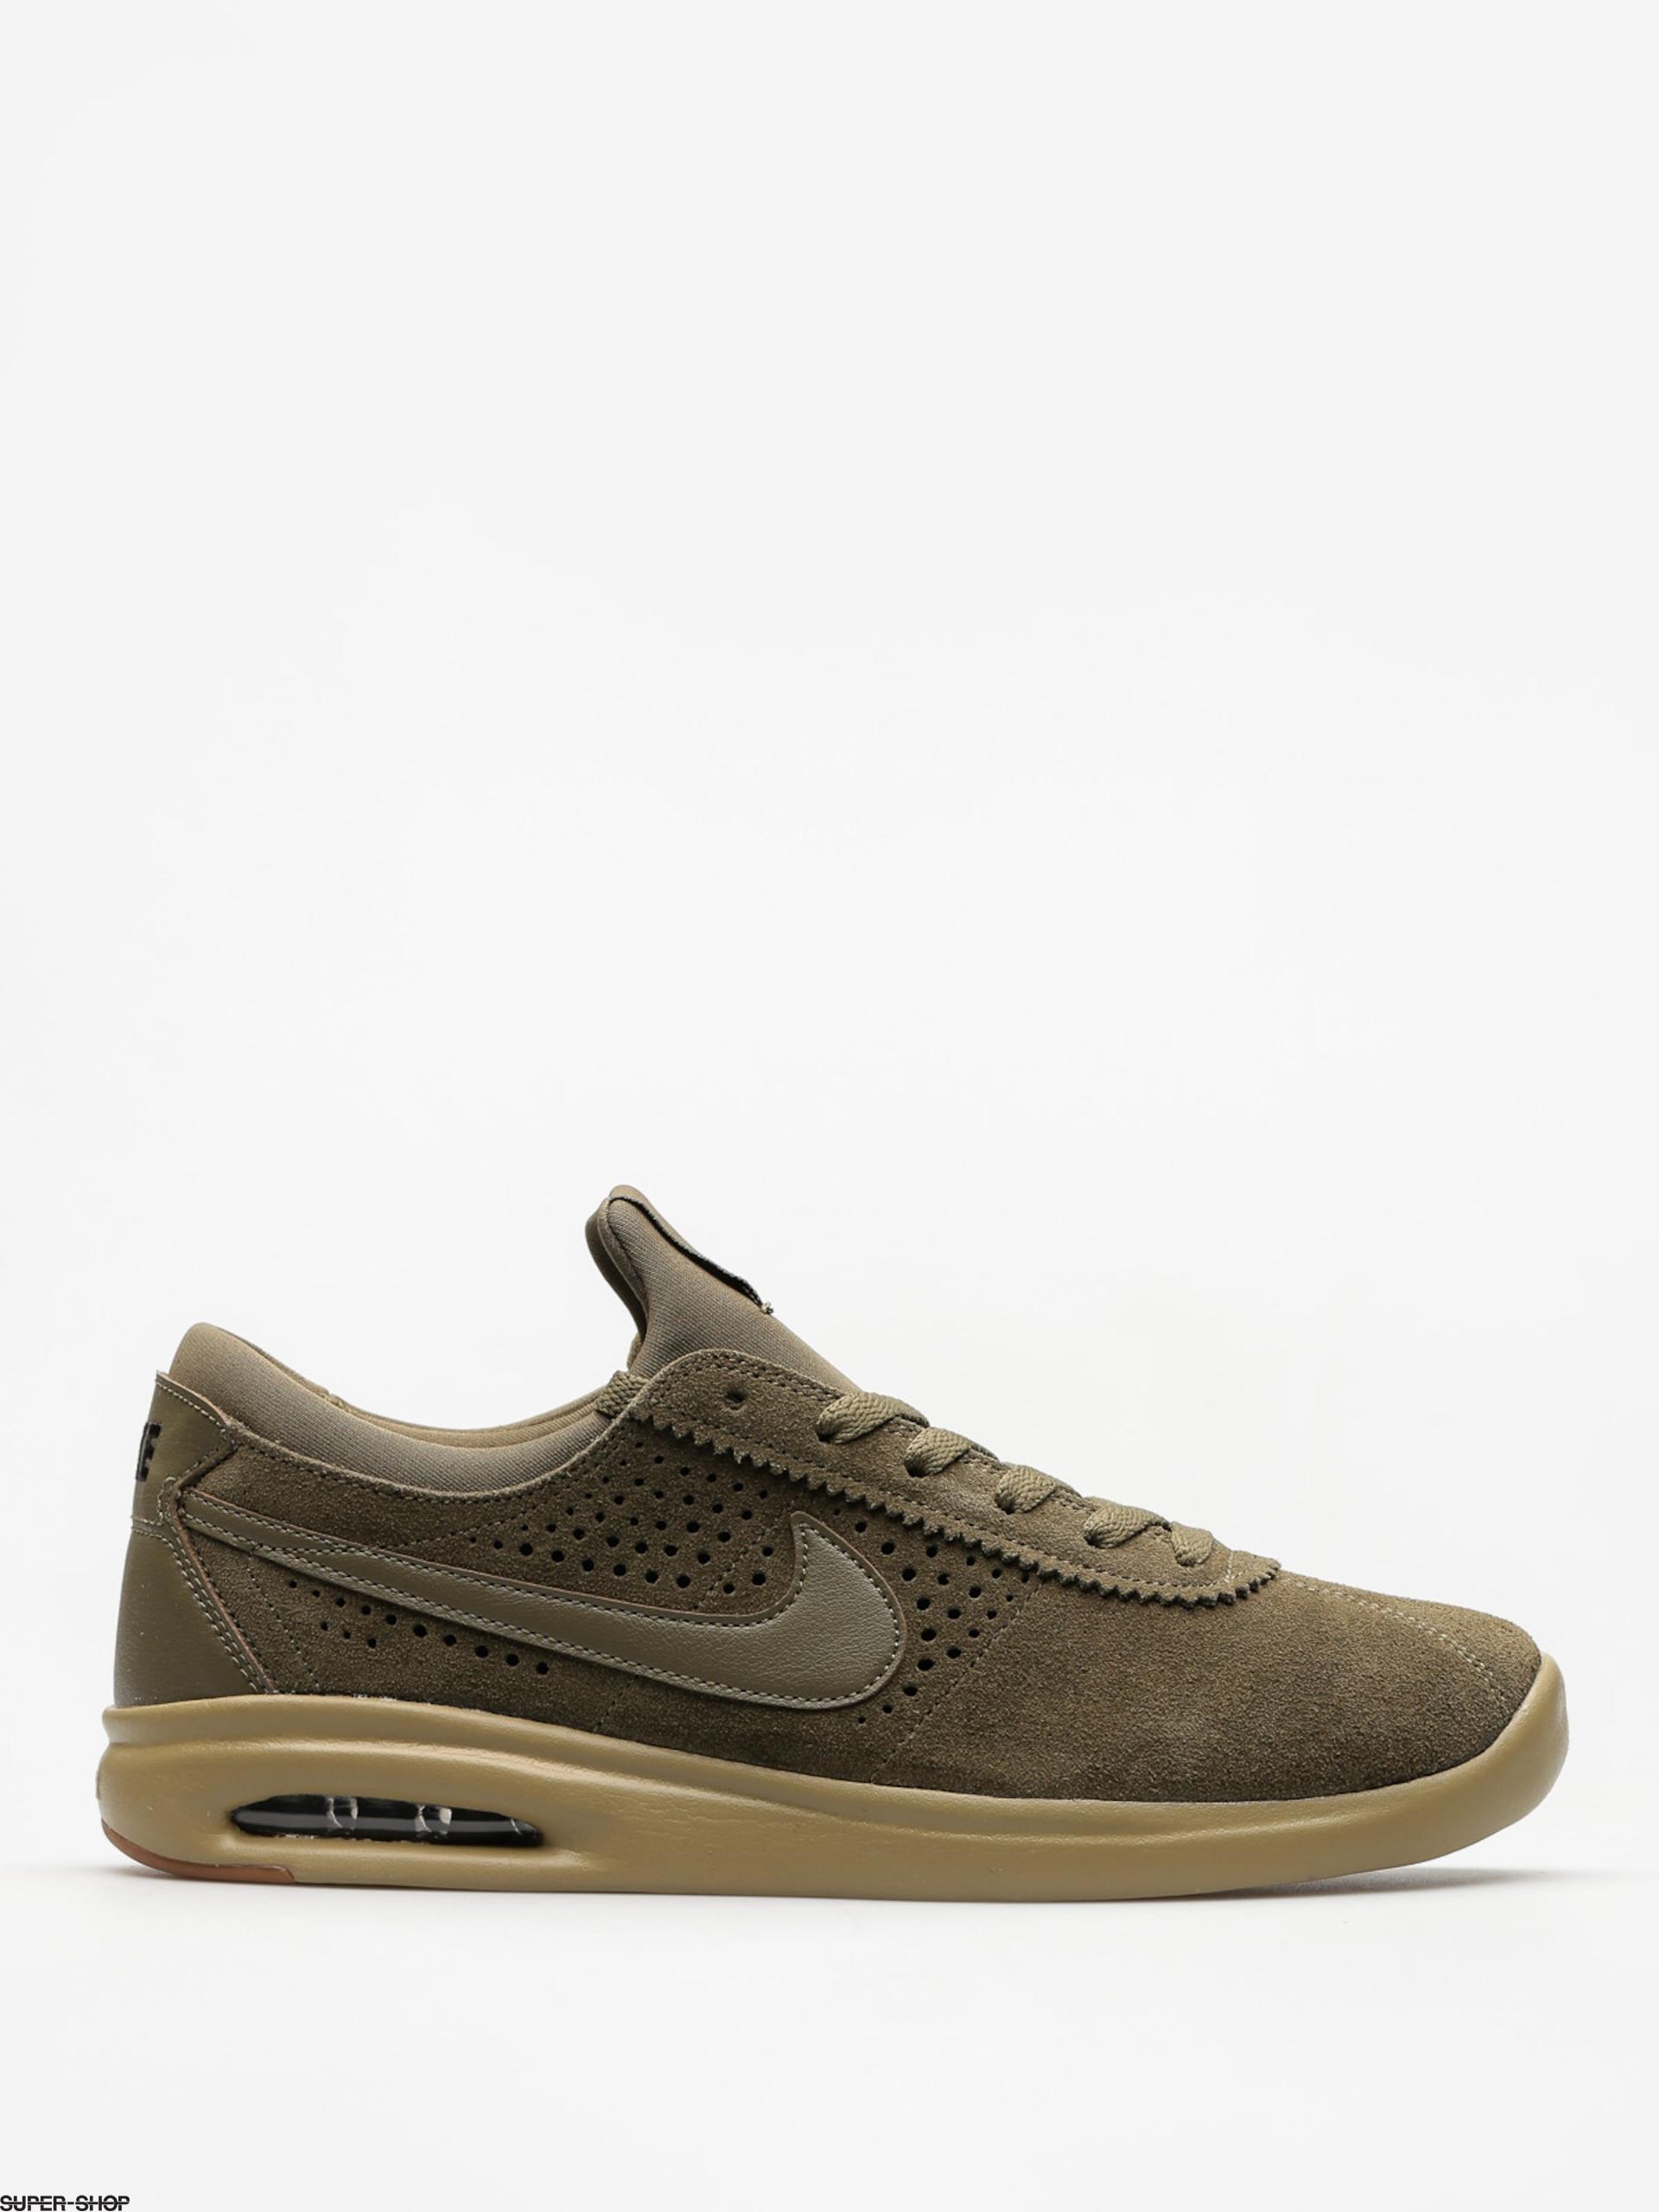 online retailer 1ebcb c2451 Nike SB Shoes Sb Air Max Bruin Vapor (medium olive/medium olive neutral  olive)